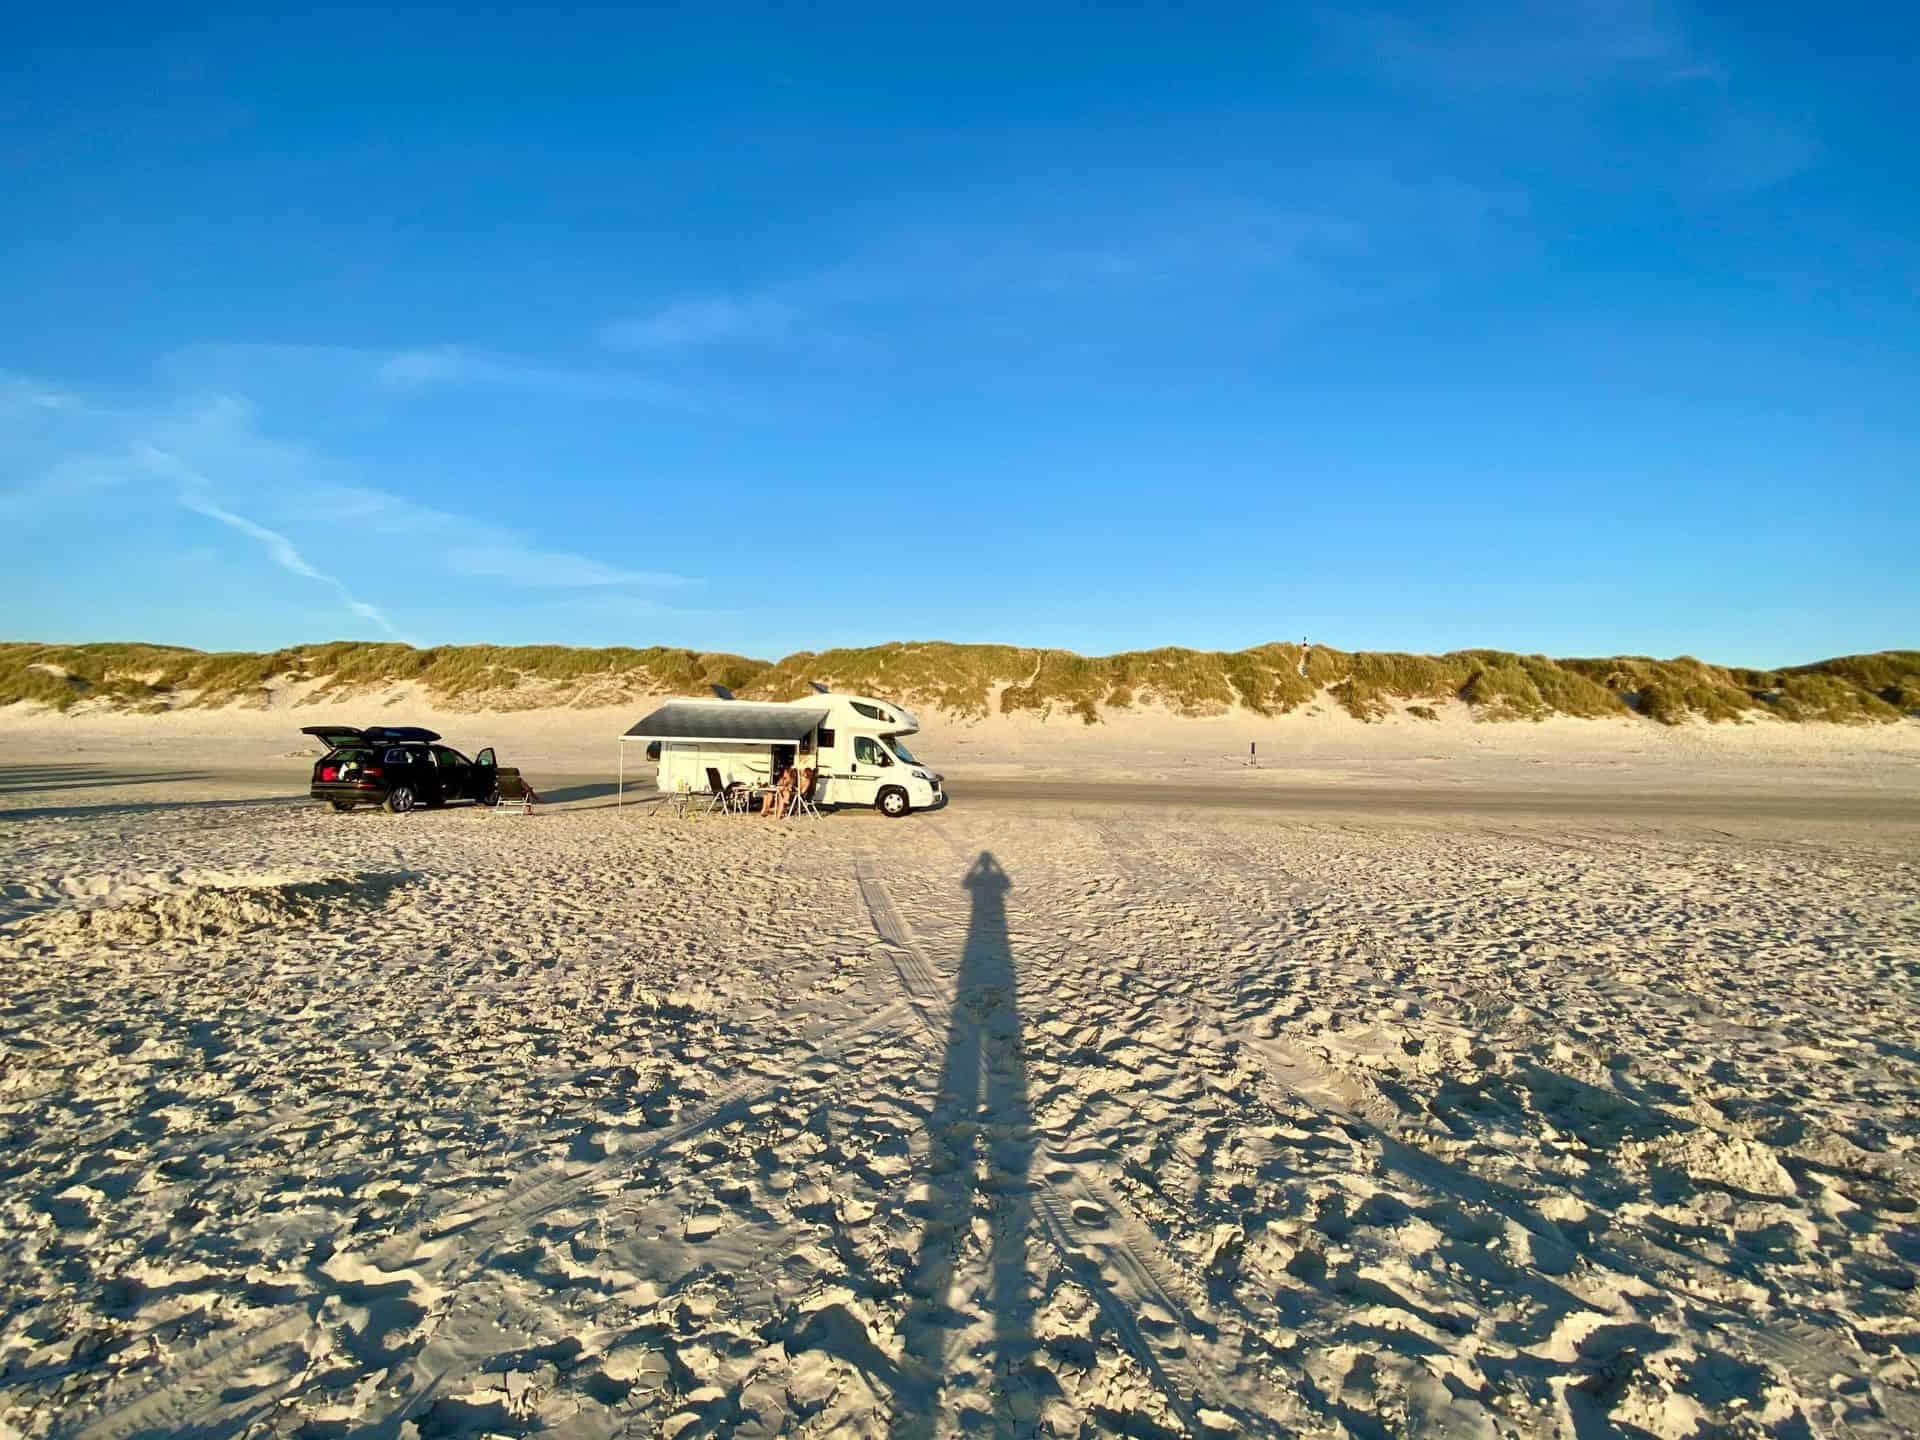 Reise-Wohnmobil-Daenemark-Vejers-Unser-Womo-am-Strand